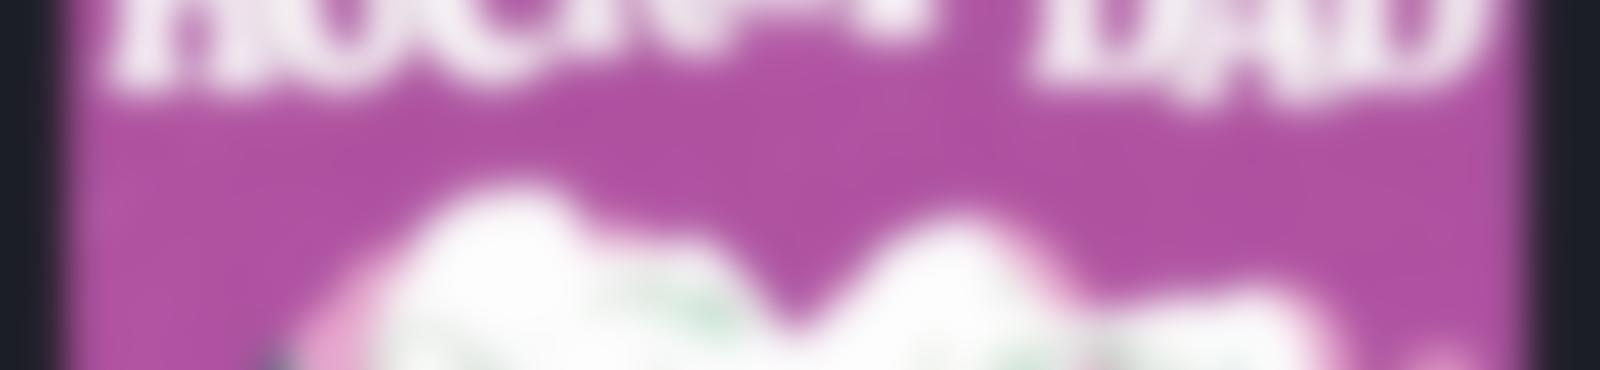 Blurred 16281c48 d4f4 4ef3 904e ff44fb7d0f13